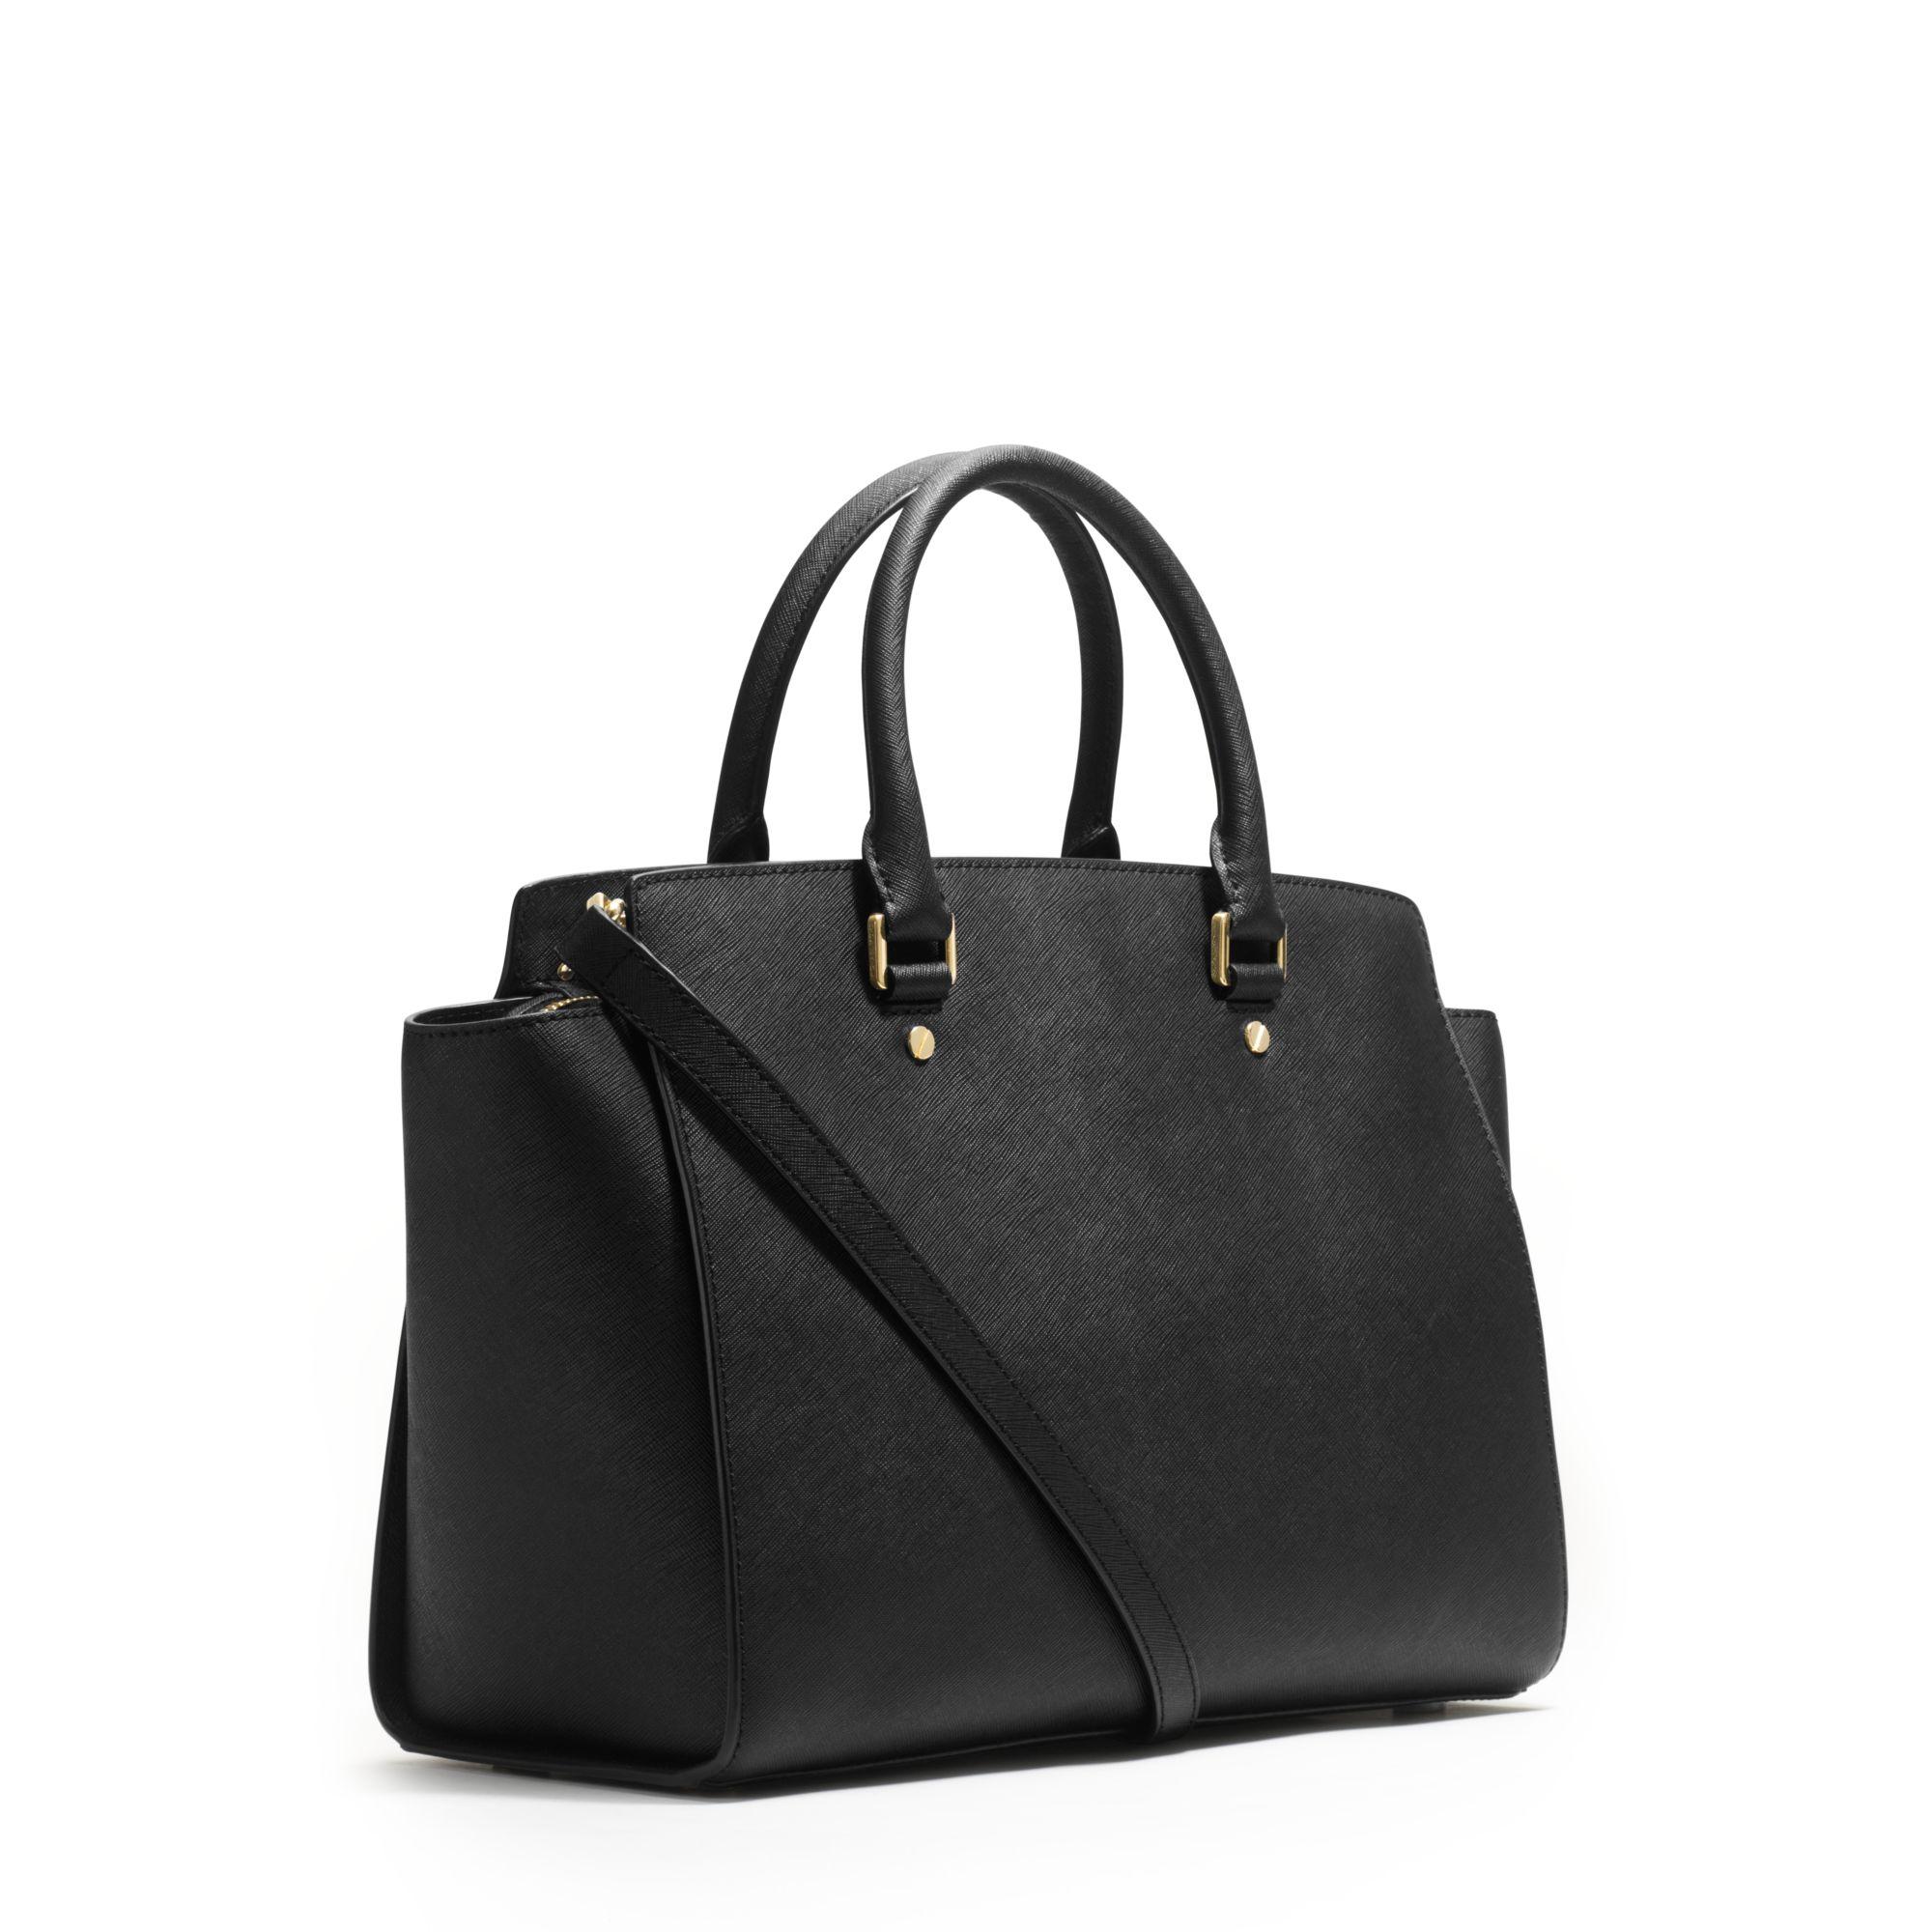 michael kors large selma saffiano satchel. Black Bedroom Furniture Sets. Home Design Ideas